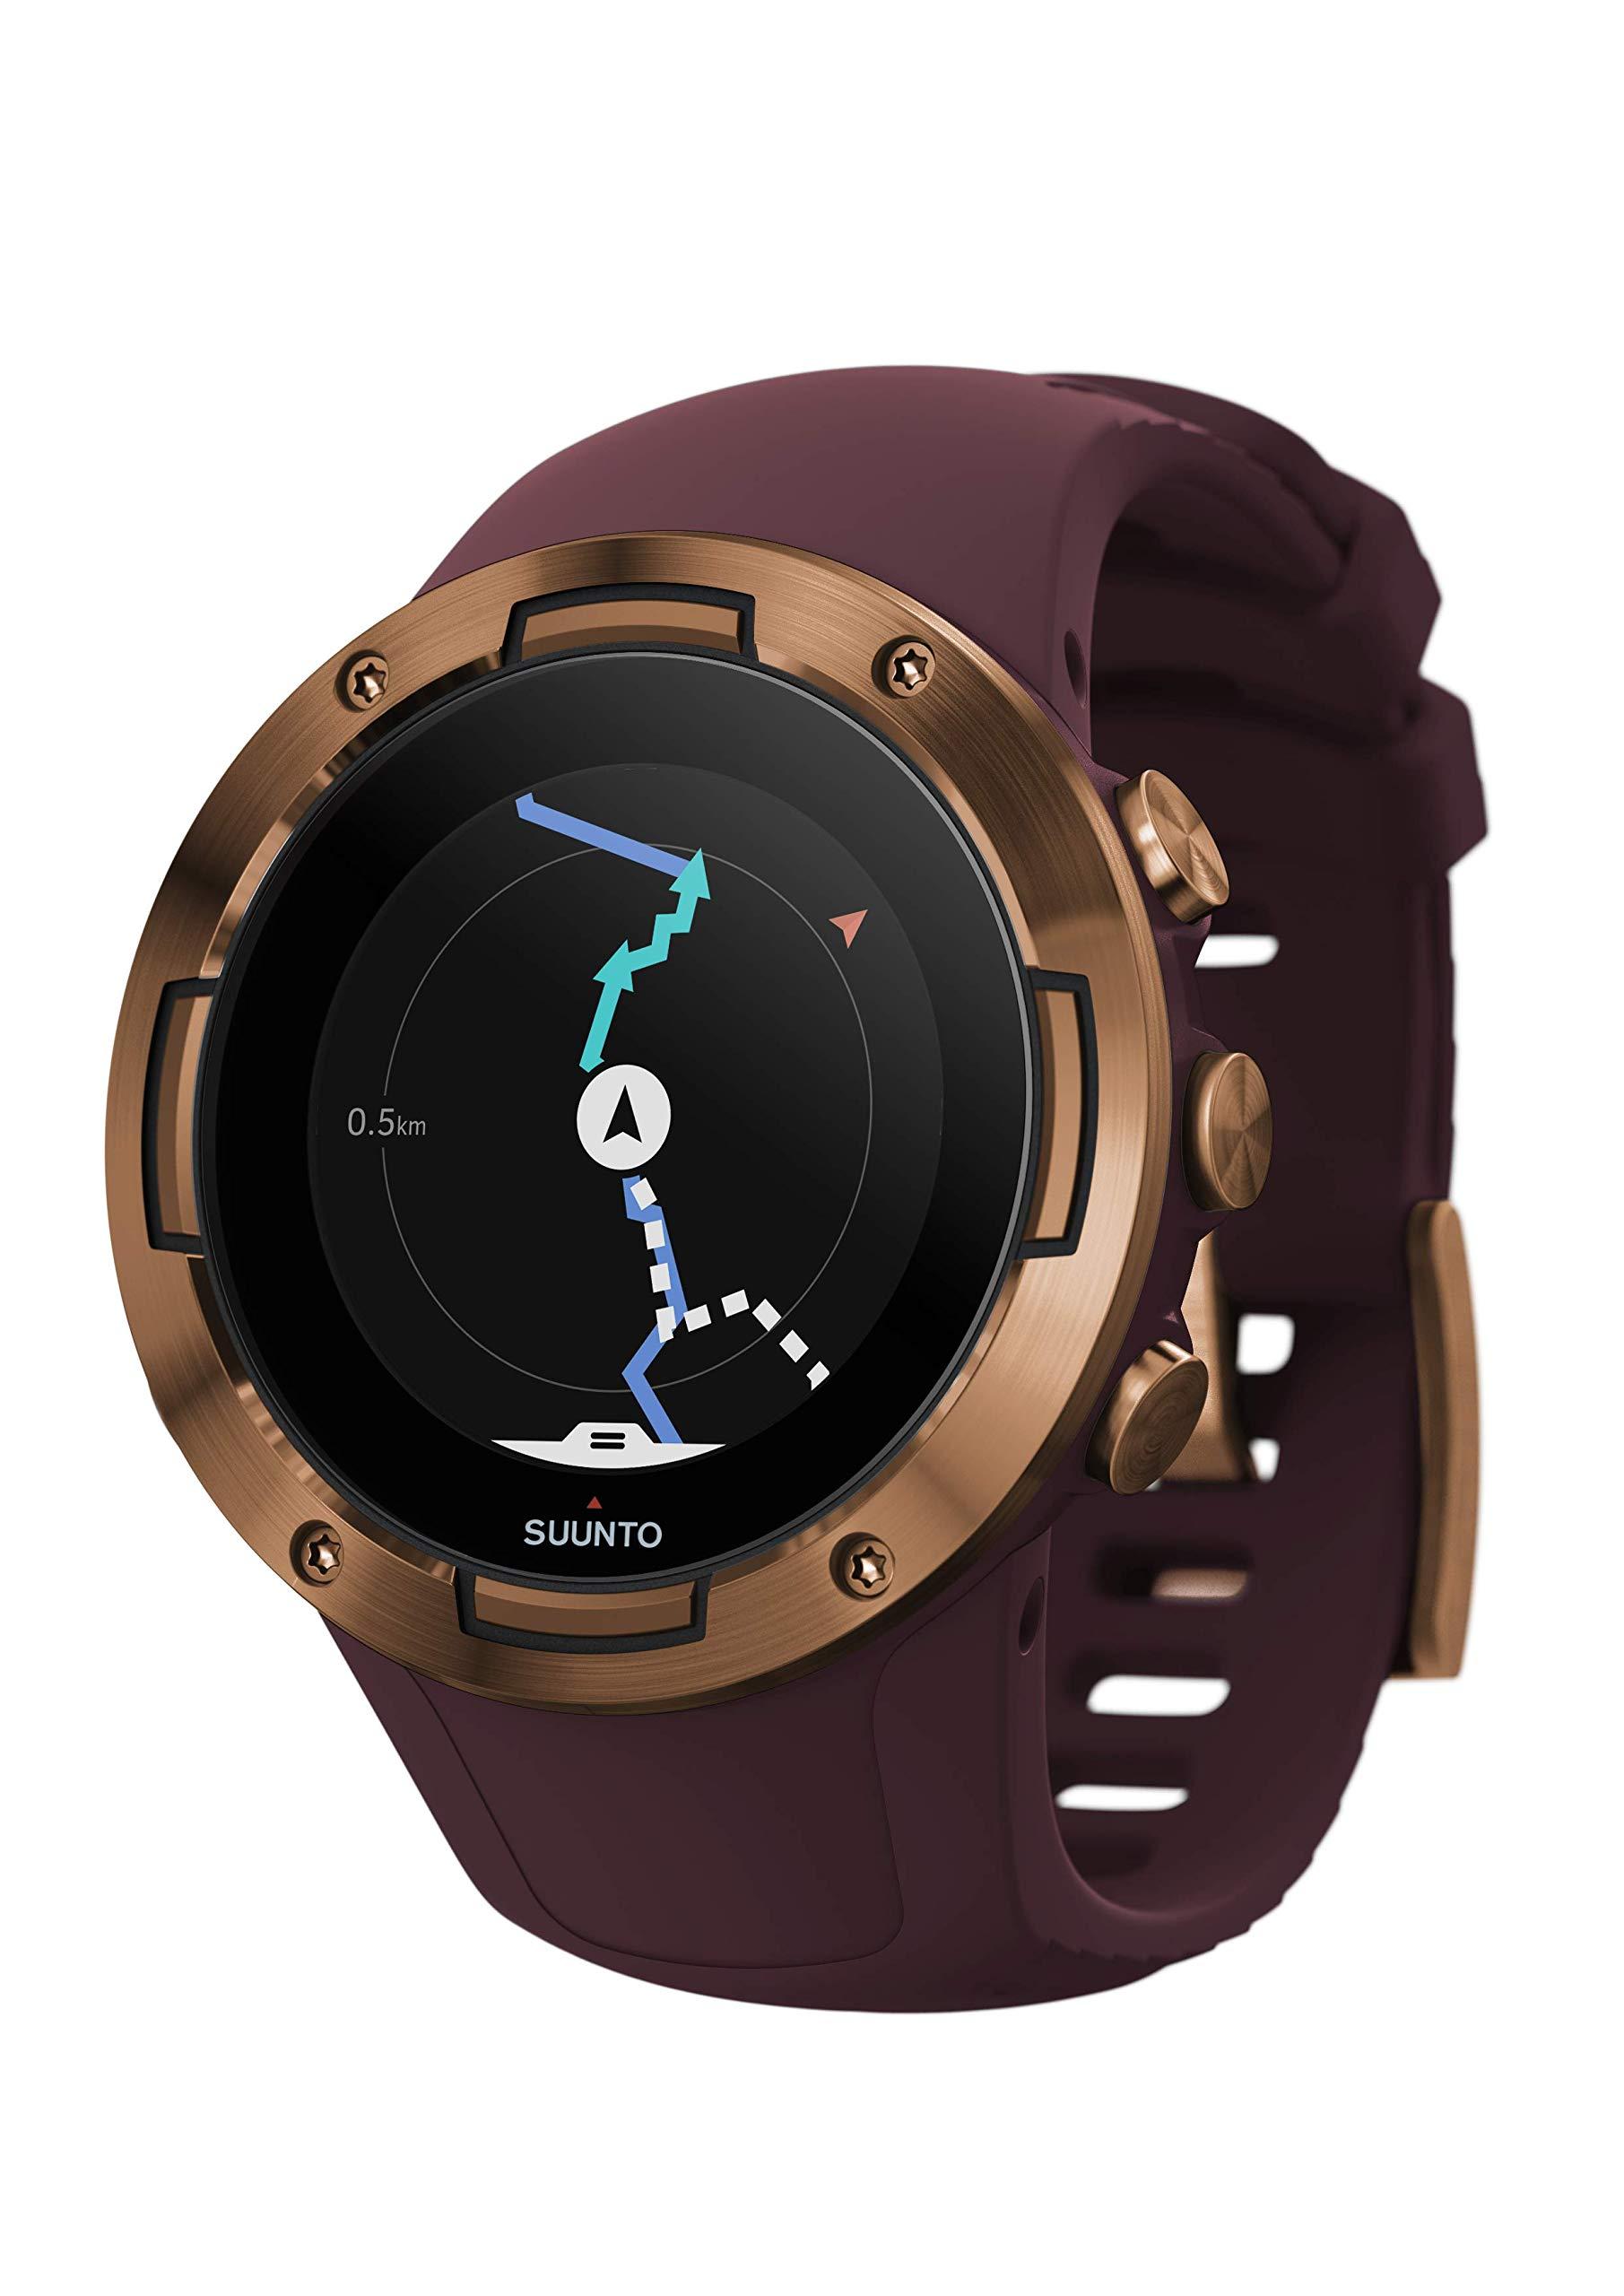 Suunto 5 Multisport GPS Watch with Wrist-Based Heart Rate Sensor Burgundy/Copper by SUUNTO